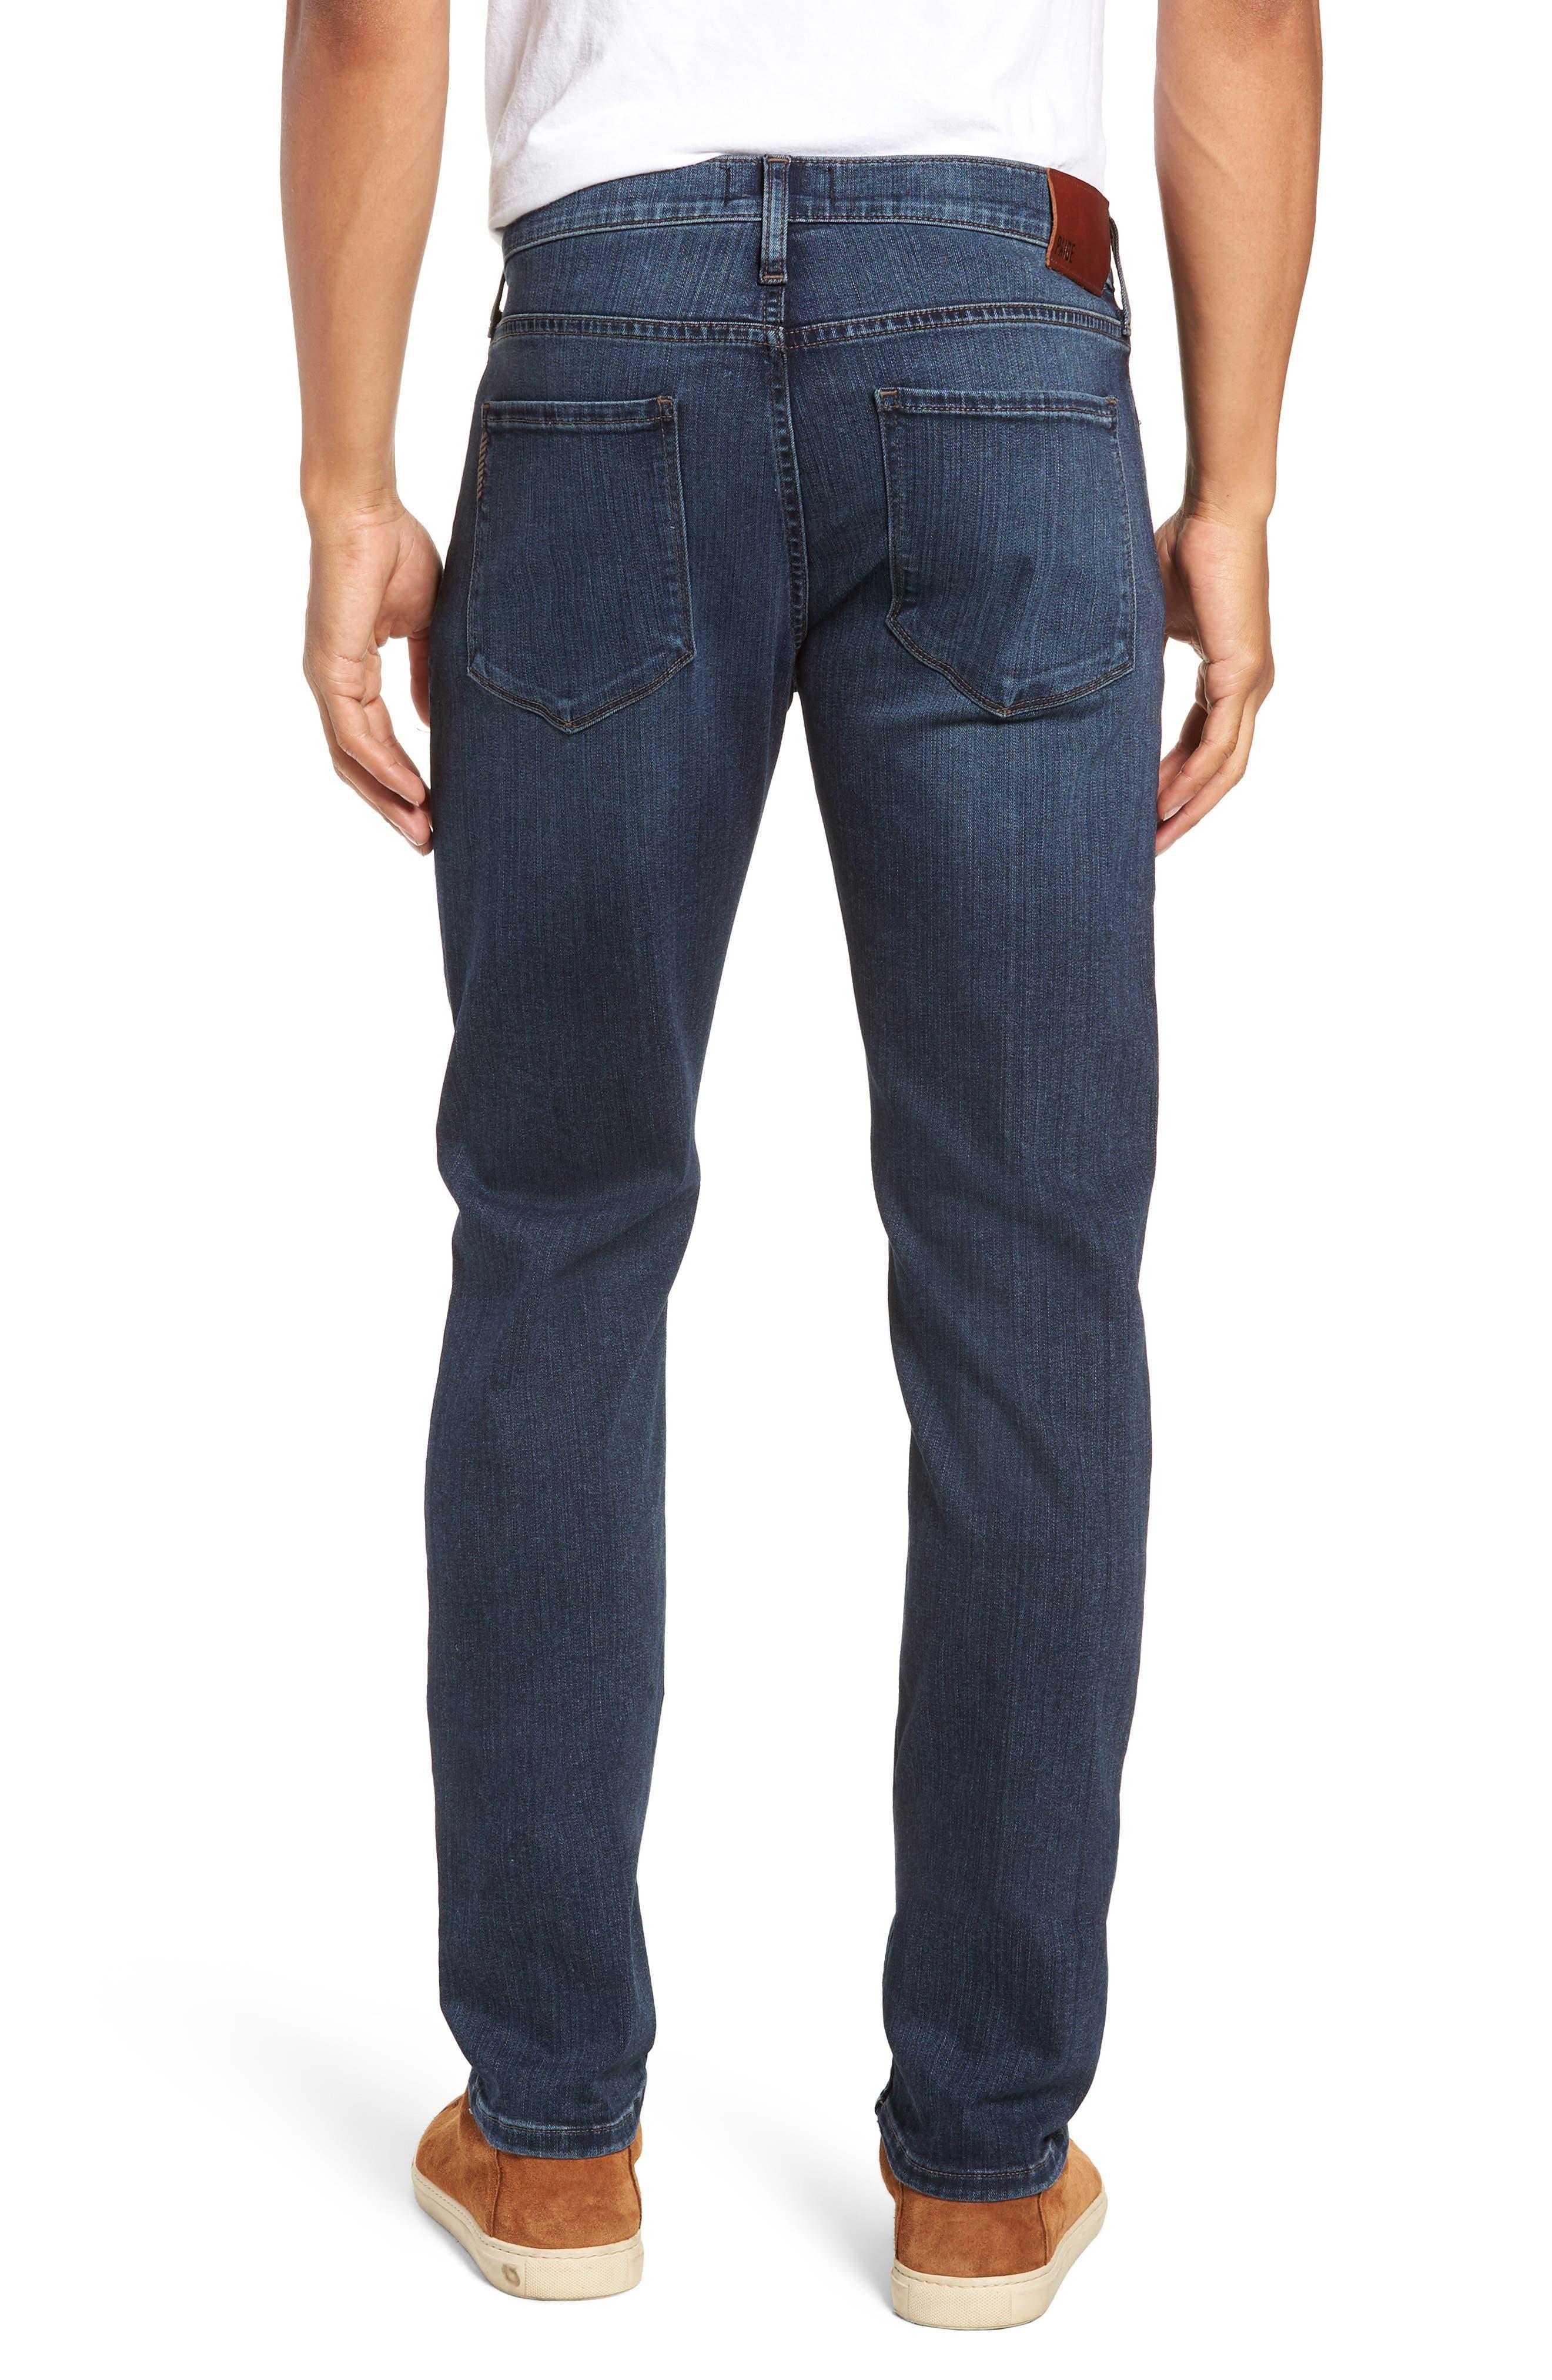 Transcend - Lennox Slim Fit Jeans,                             Alternate thumbnail 2, color,                             400